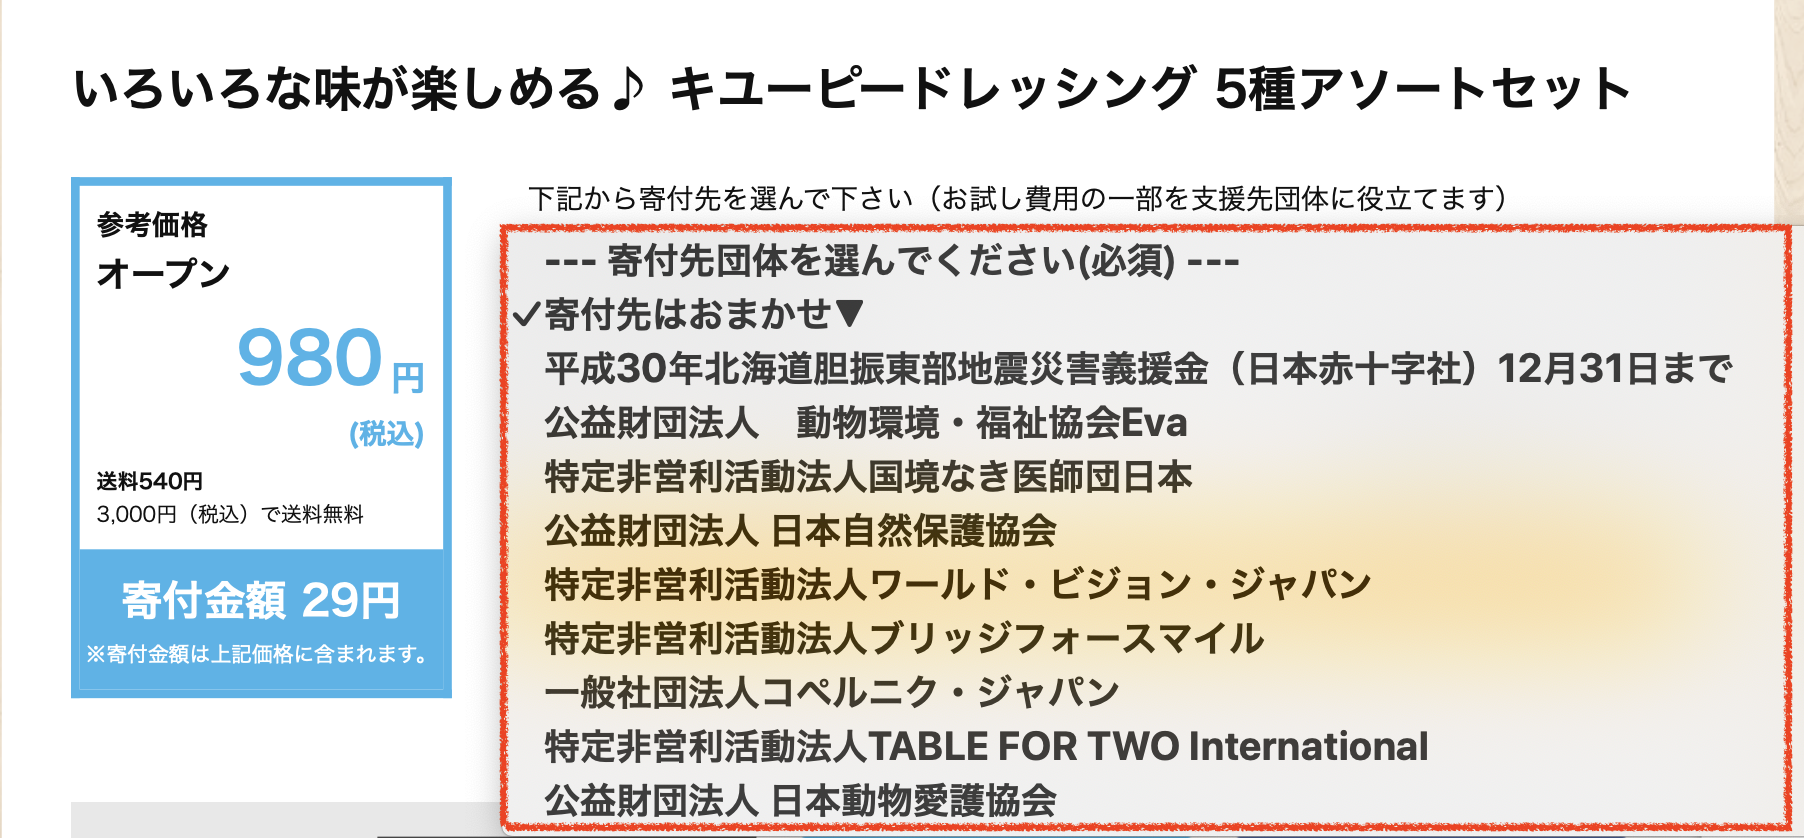 Otameshi(オタメシ) 寄付例